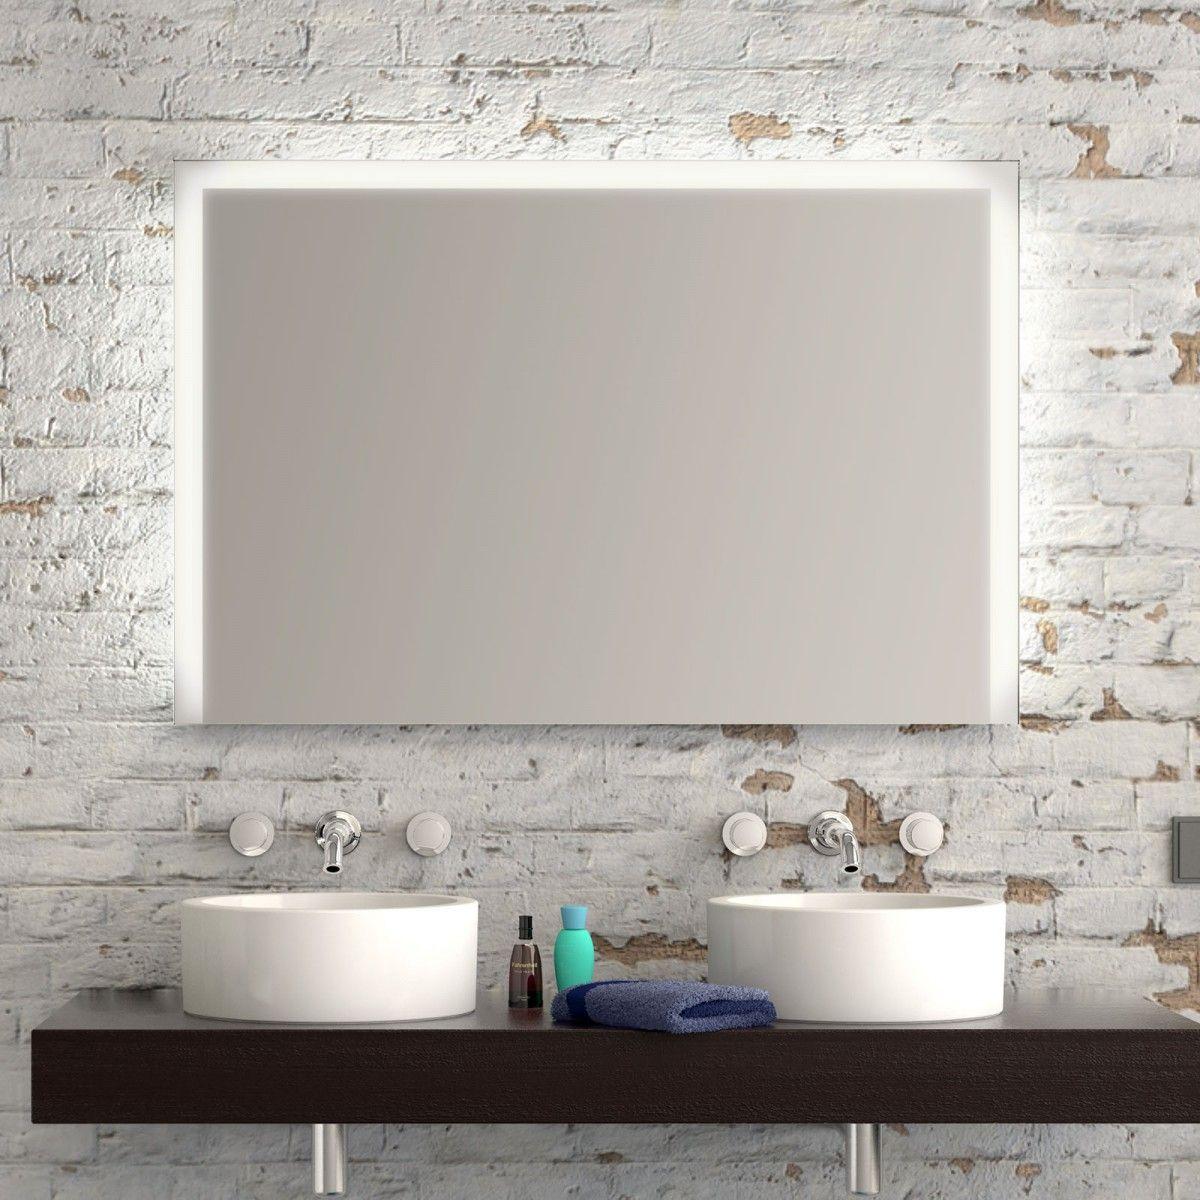 Ayna Amp Ayna Modelleri Ayna Badspiegel Beleuchtet Badspiegel Badezimmerspiegel